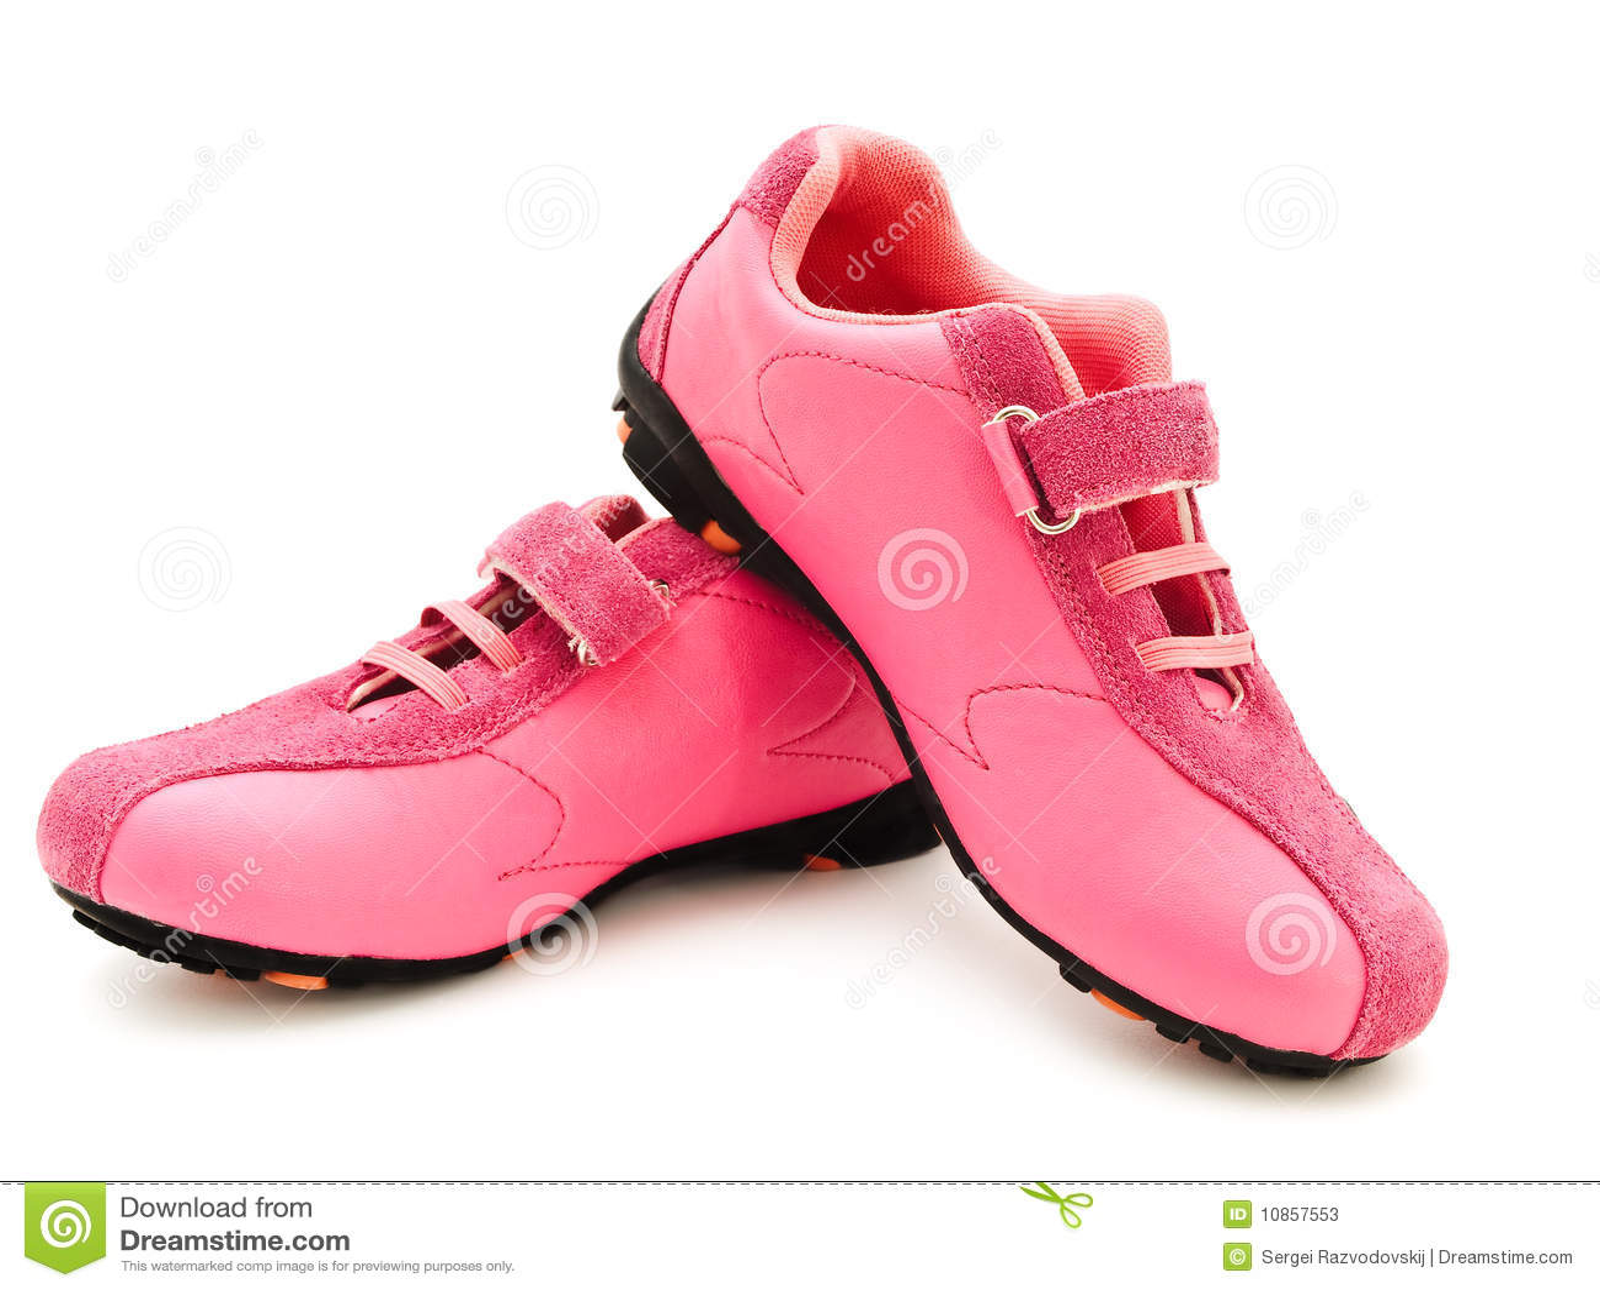 Jogging Shoes Stock Image - Image: 8440791